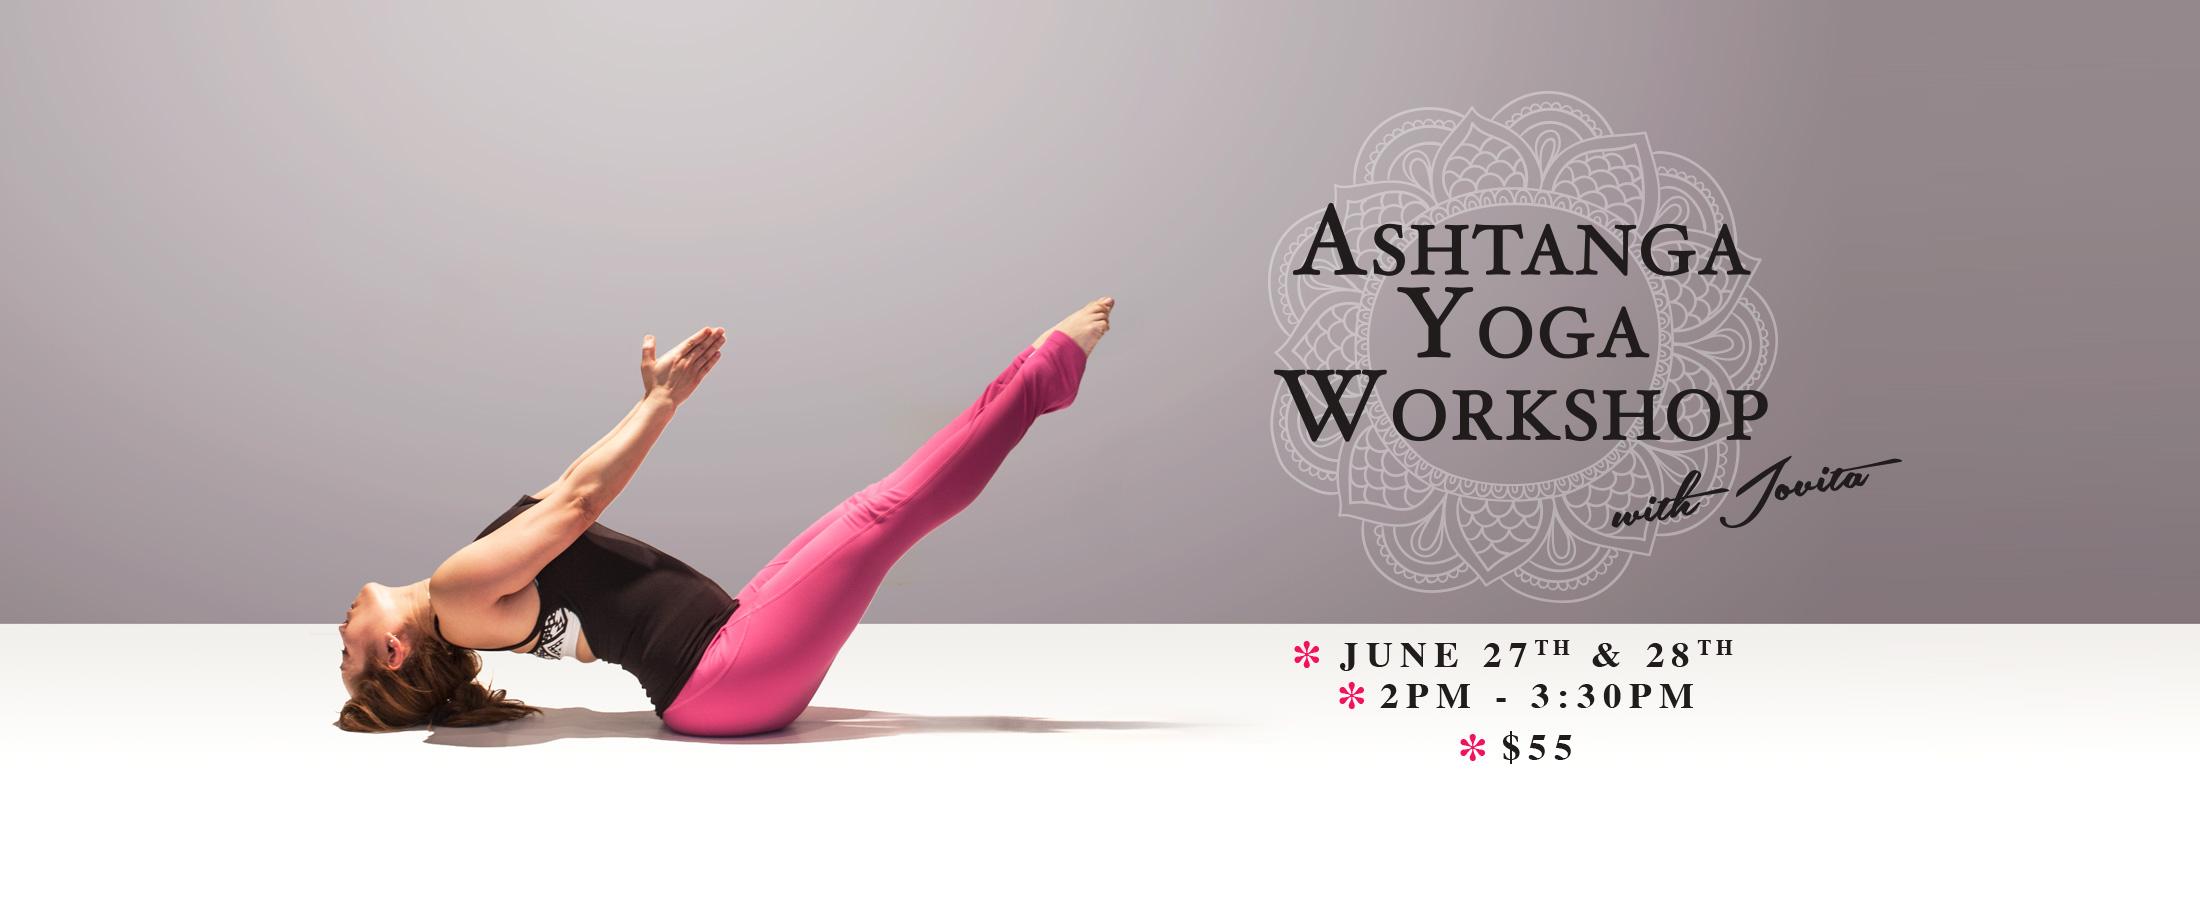 ashtanga workshop hot yoga markham jovita